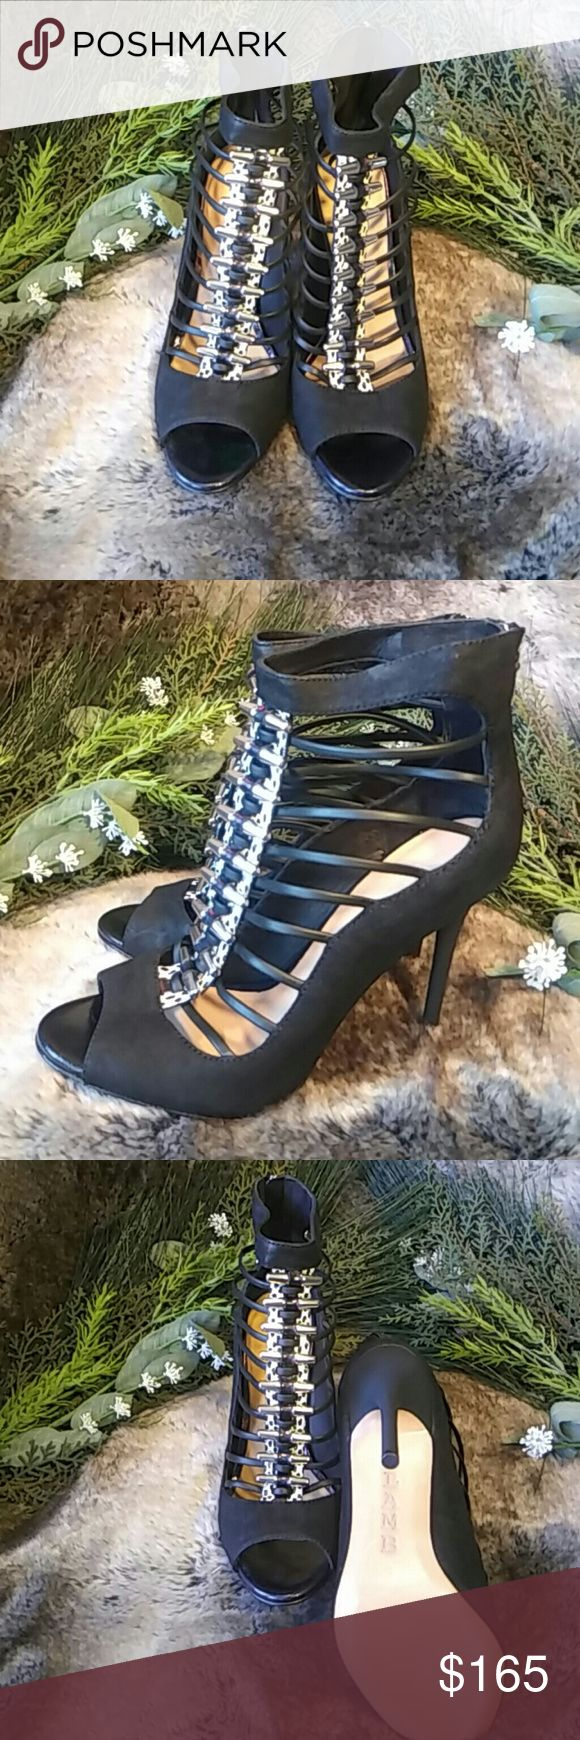 Lamb strappy heels Designer stilletos heel strappy sandals in black with silver detail Lamb Shoes Sandals